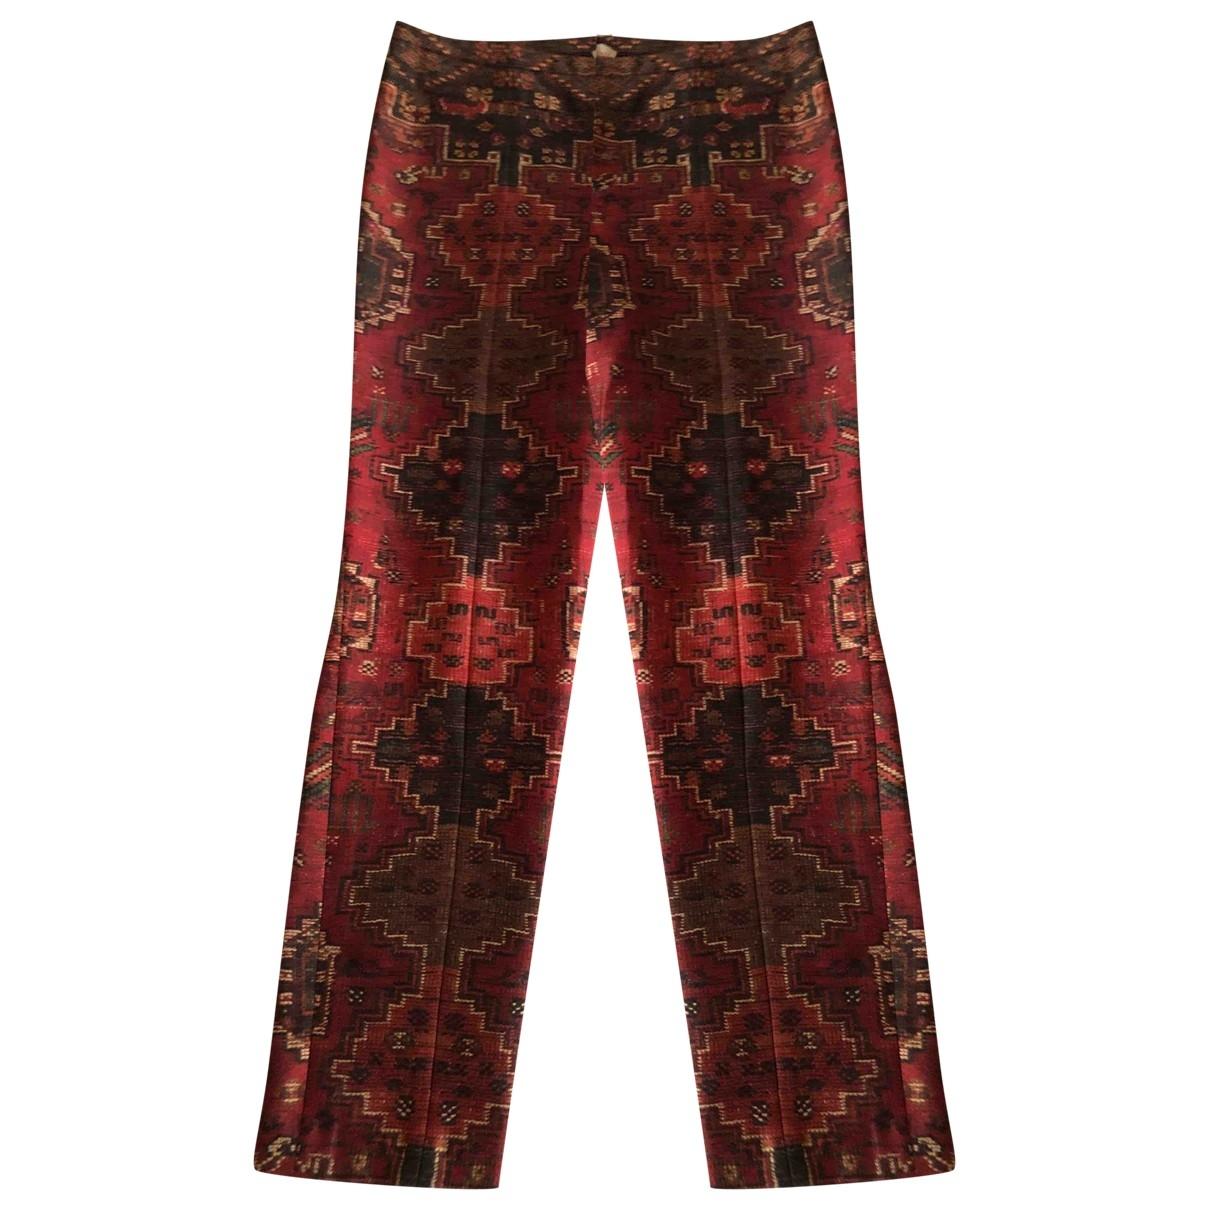 Tory Burch \N Burgundy Wool Trousers for Women 6 US